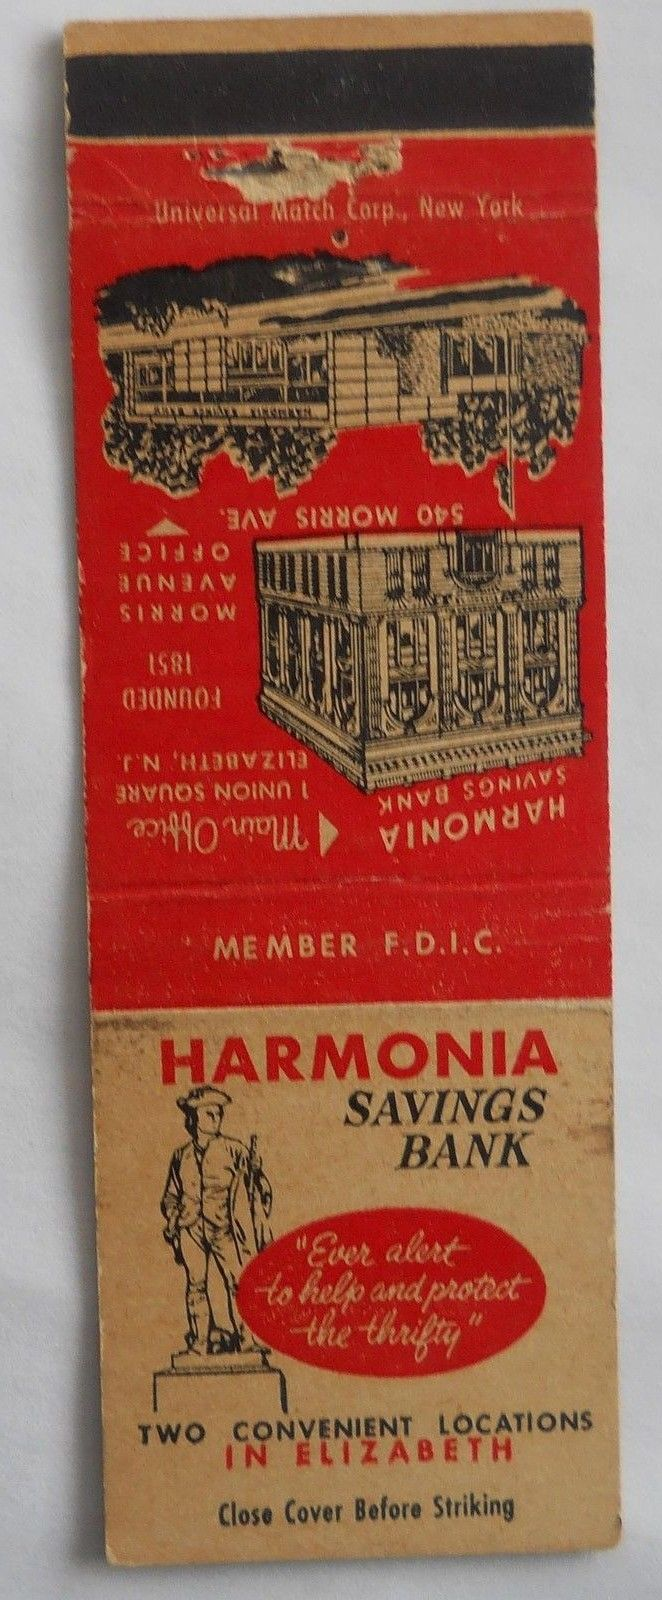 366 Harmonia Savings Bank Elizabeth Nj With Images Savings